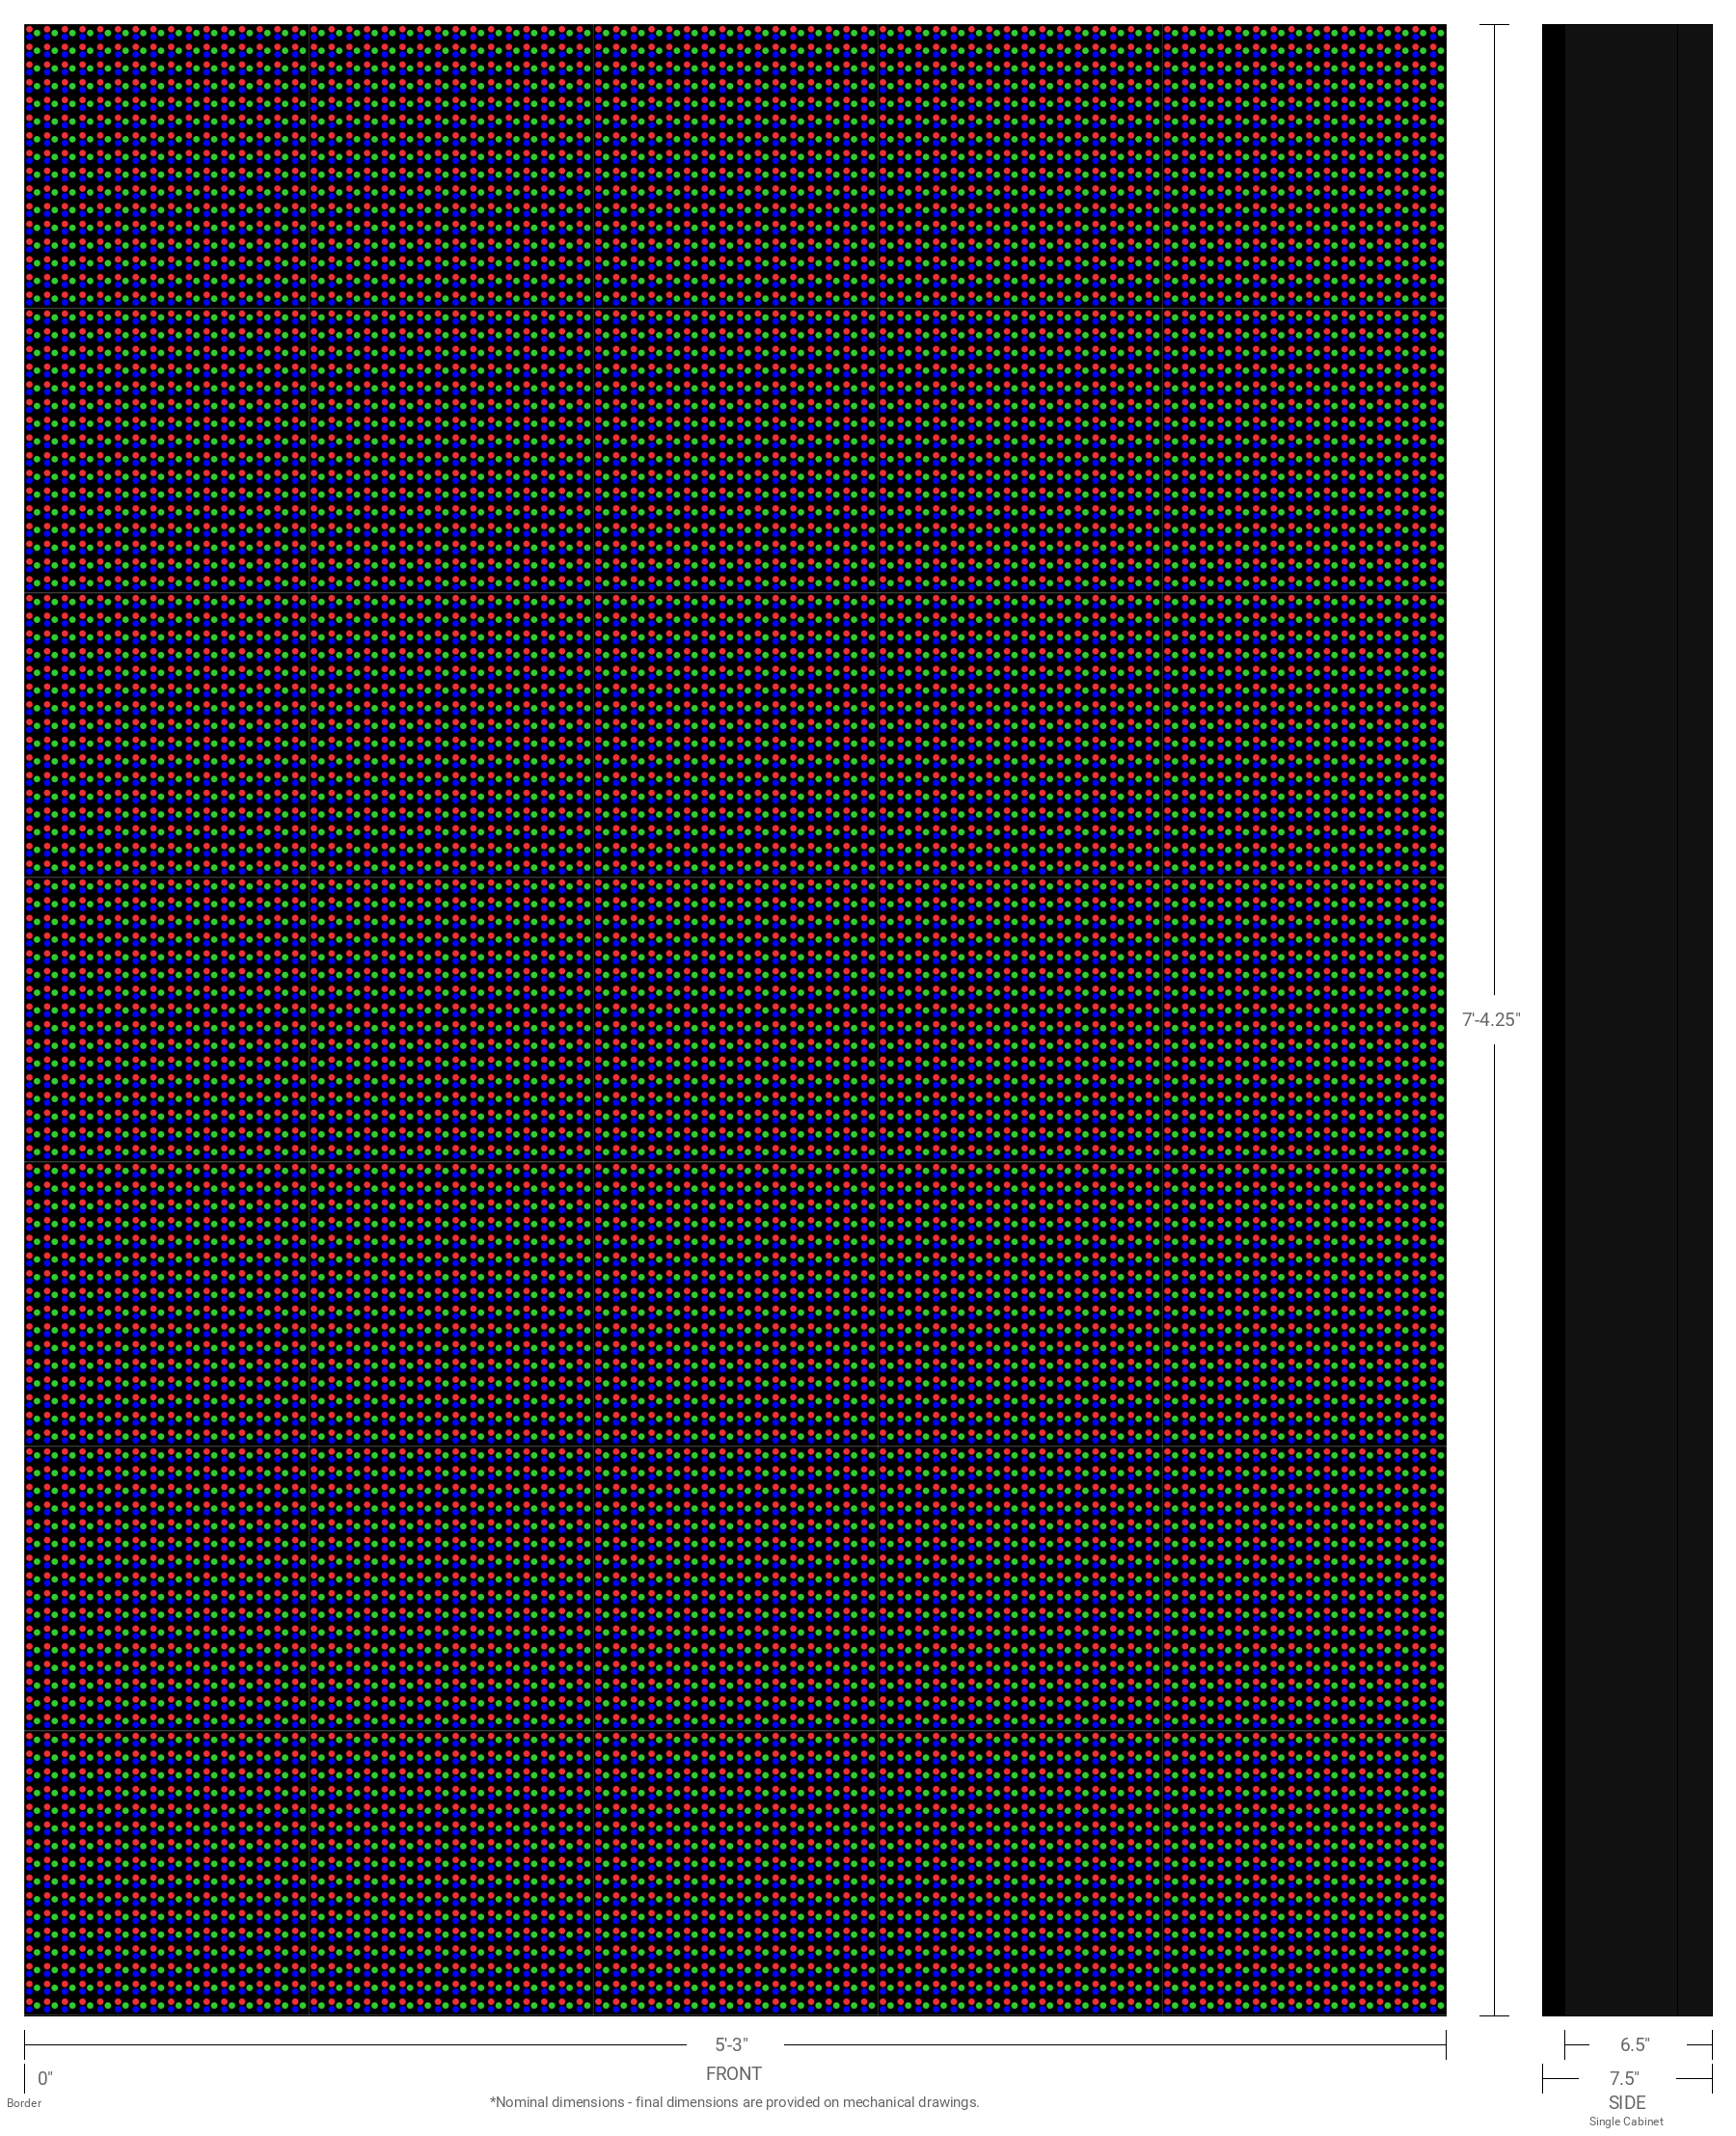 Aurora 20mm 112x80 Single Sided Full Color LED Display